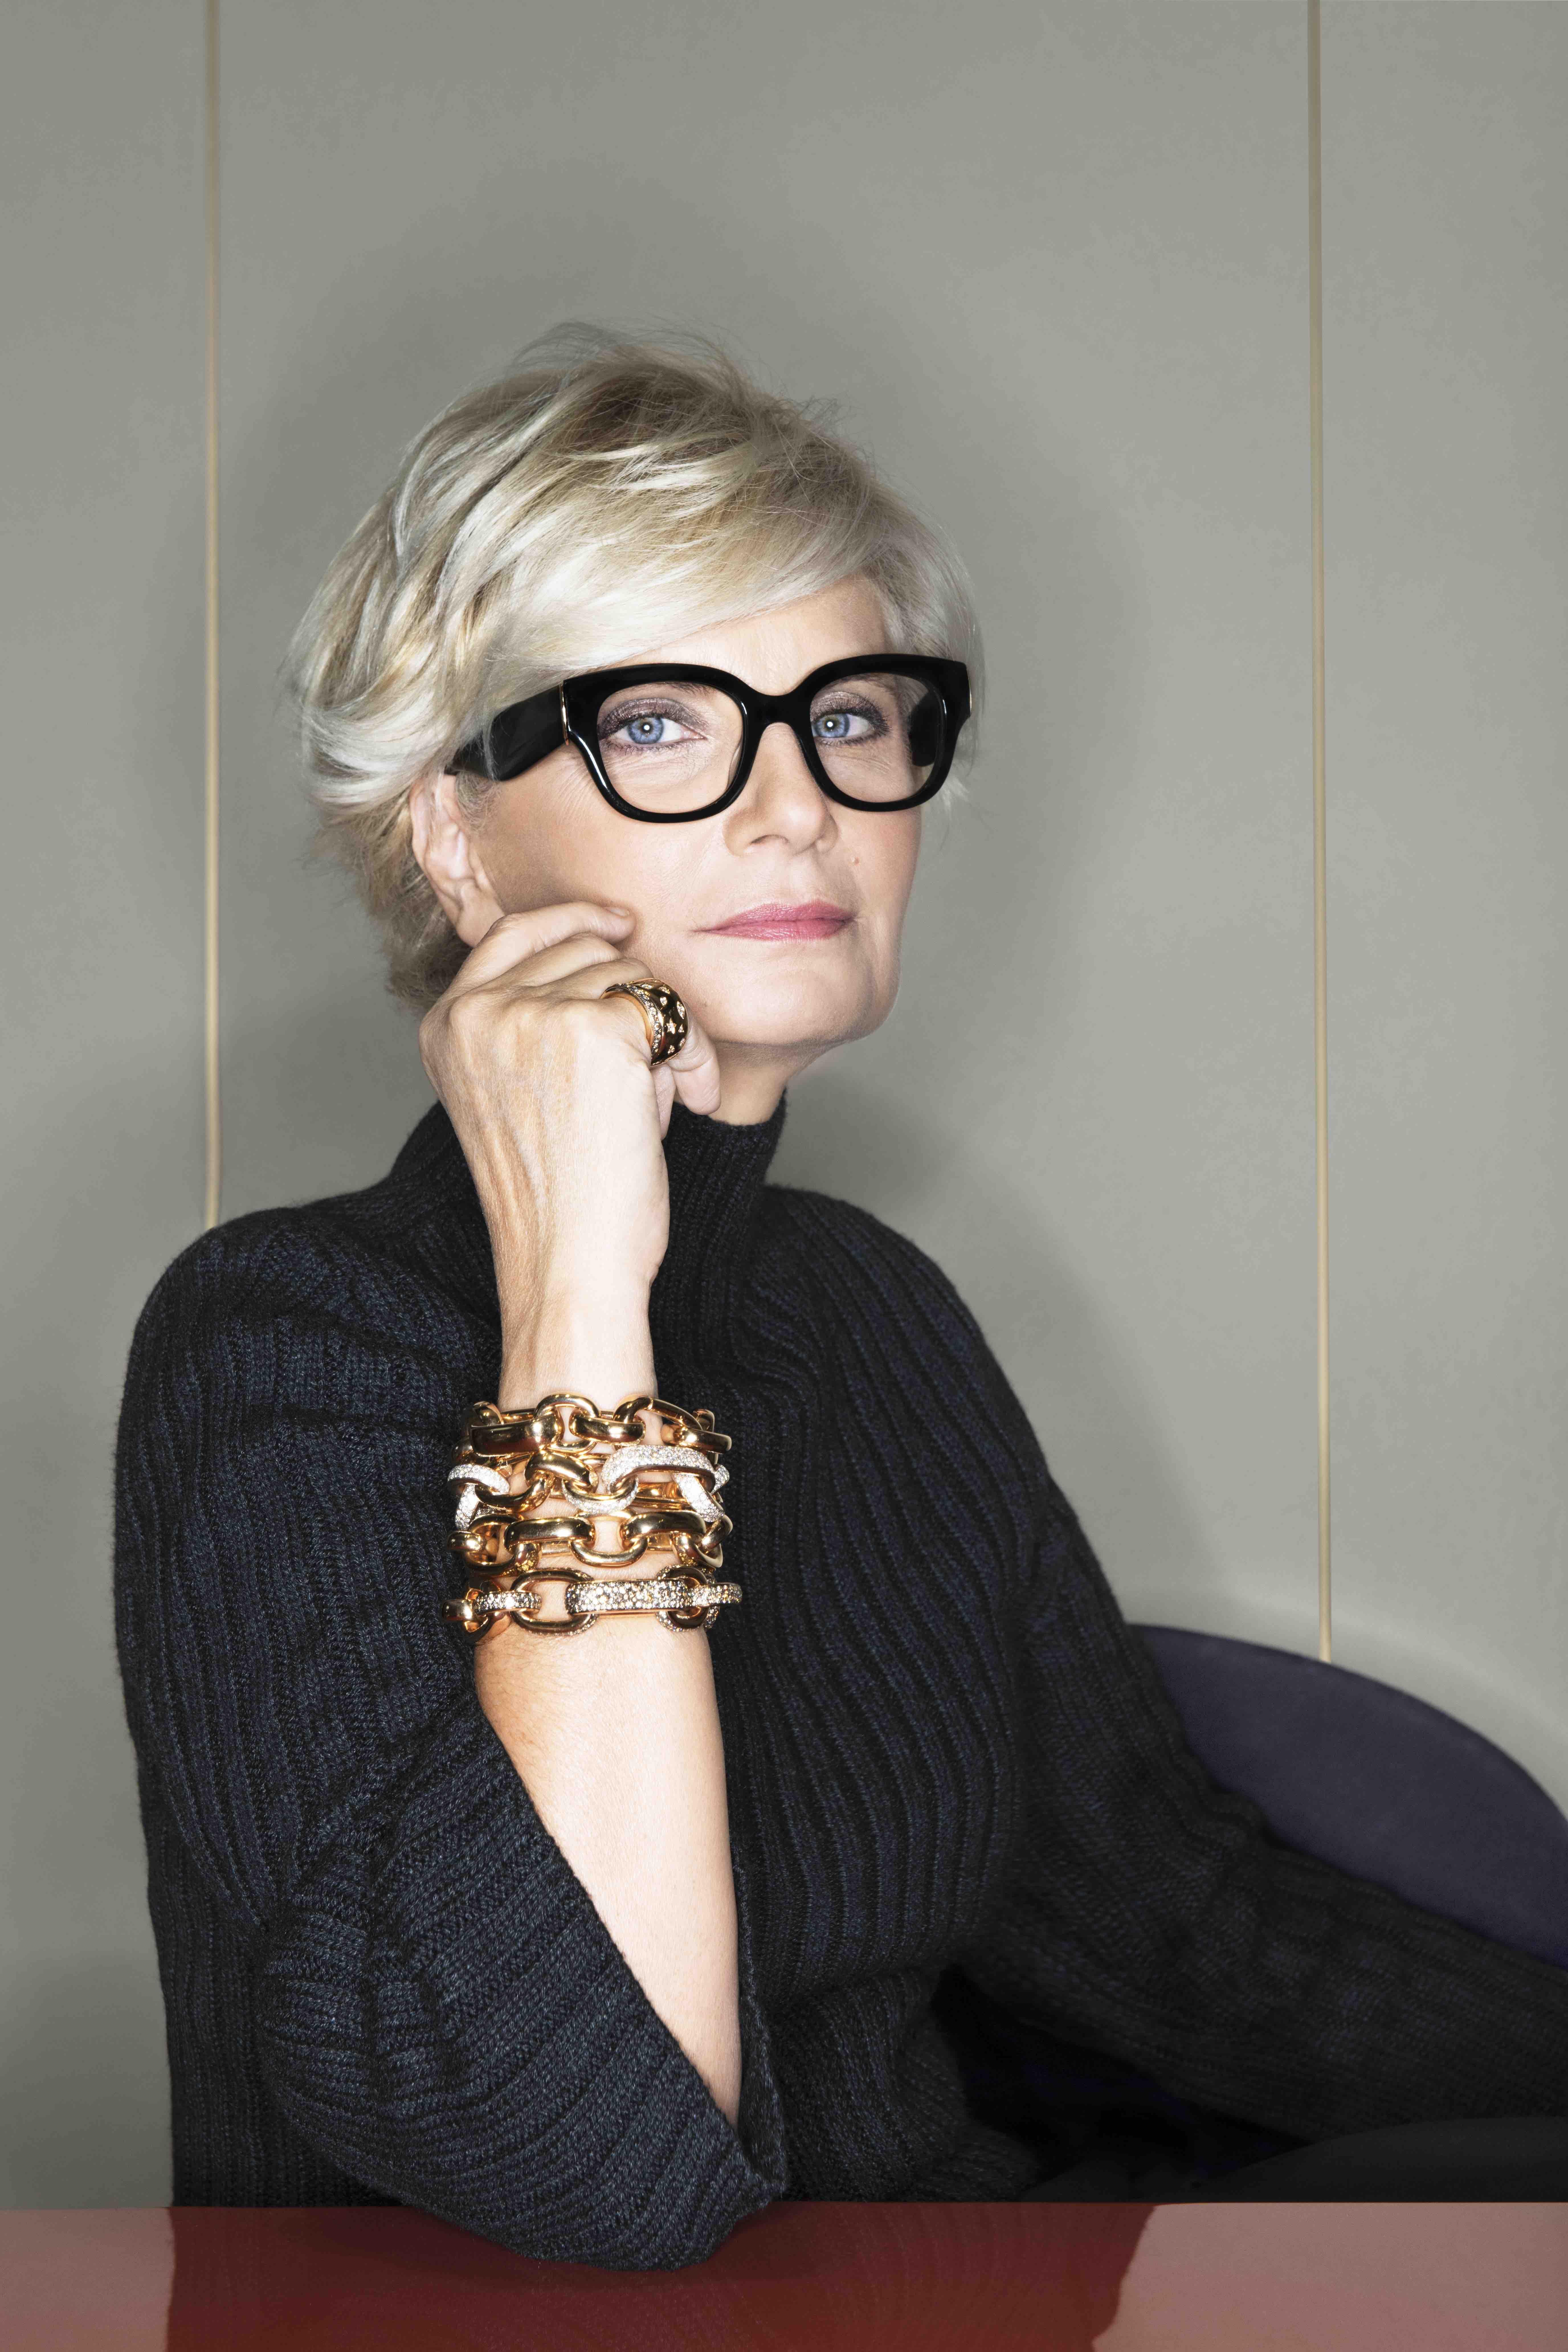 Sabina Belli Ceo Of Pomellato Group Talks Empowering Women Women Ceo Short Hair Styles Short Grey Hair